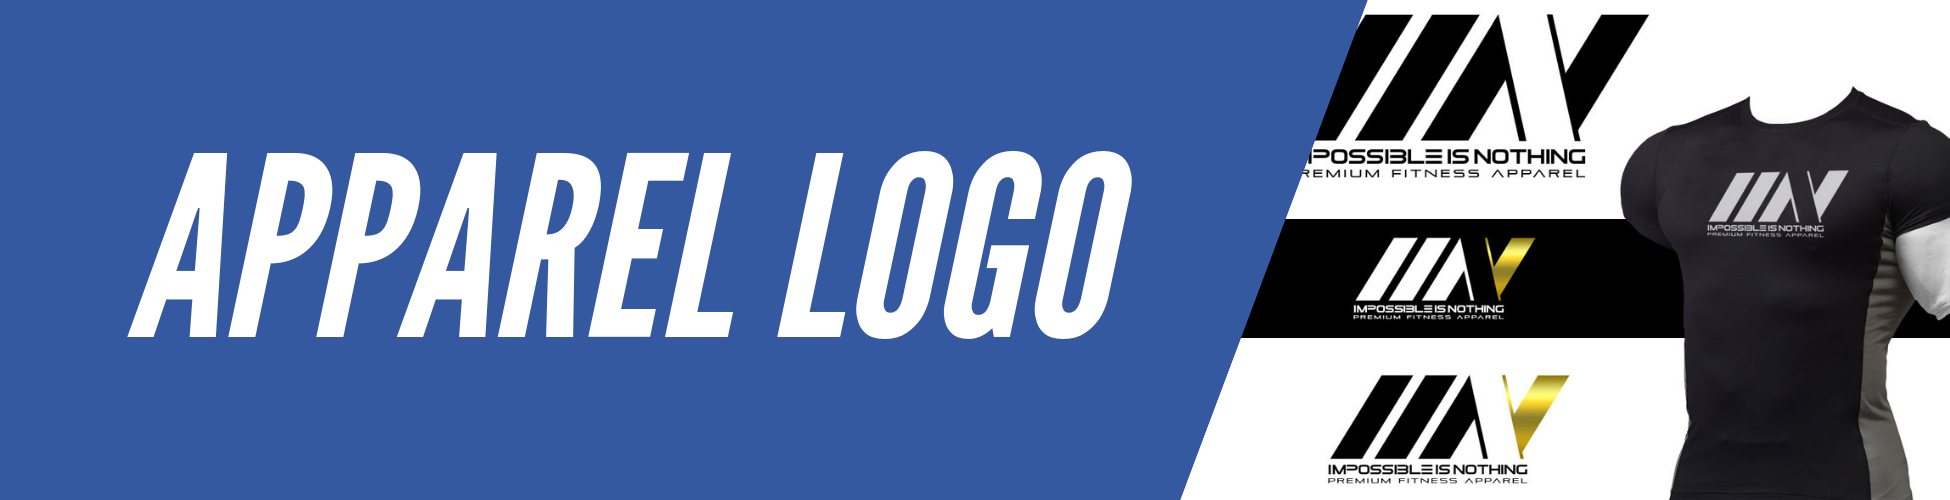 apparel-logo-banner.png